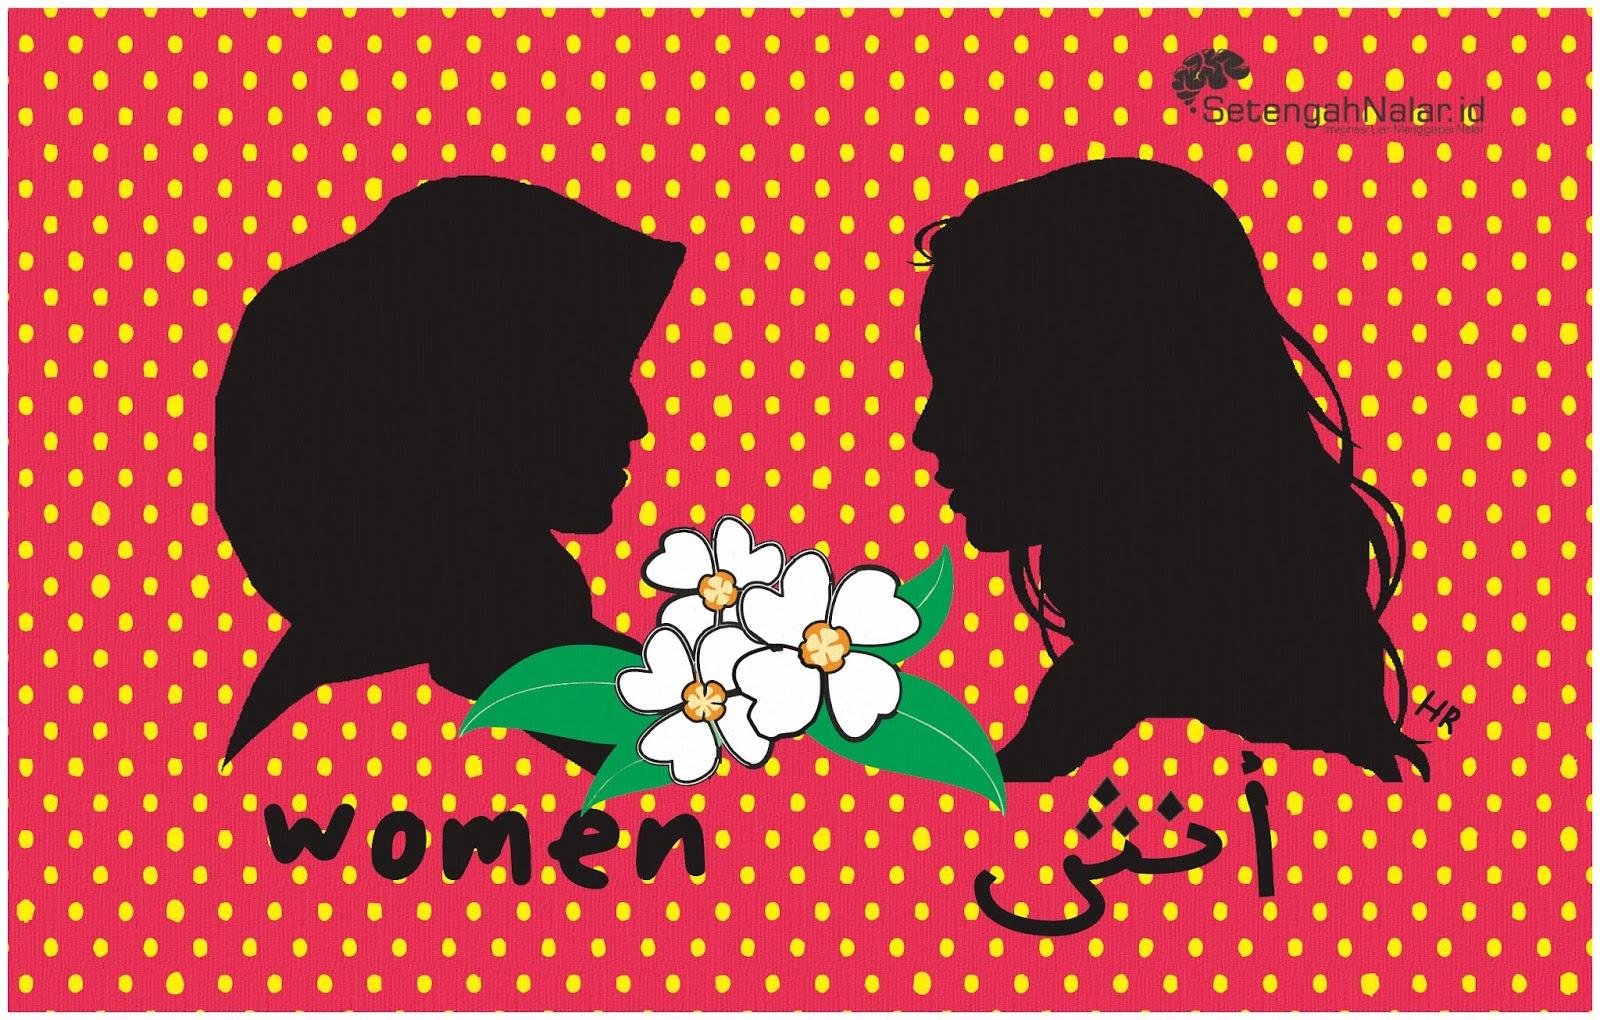 Cara Menghadapi Eksploitasi Perempuan Antara Barat Dan Islam